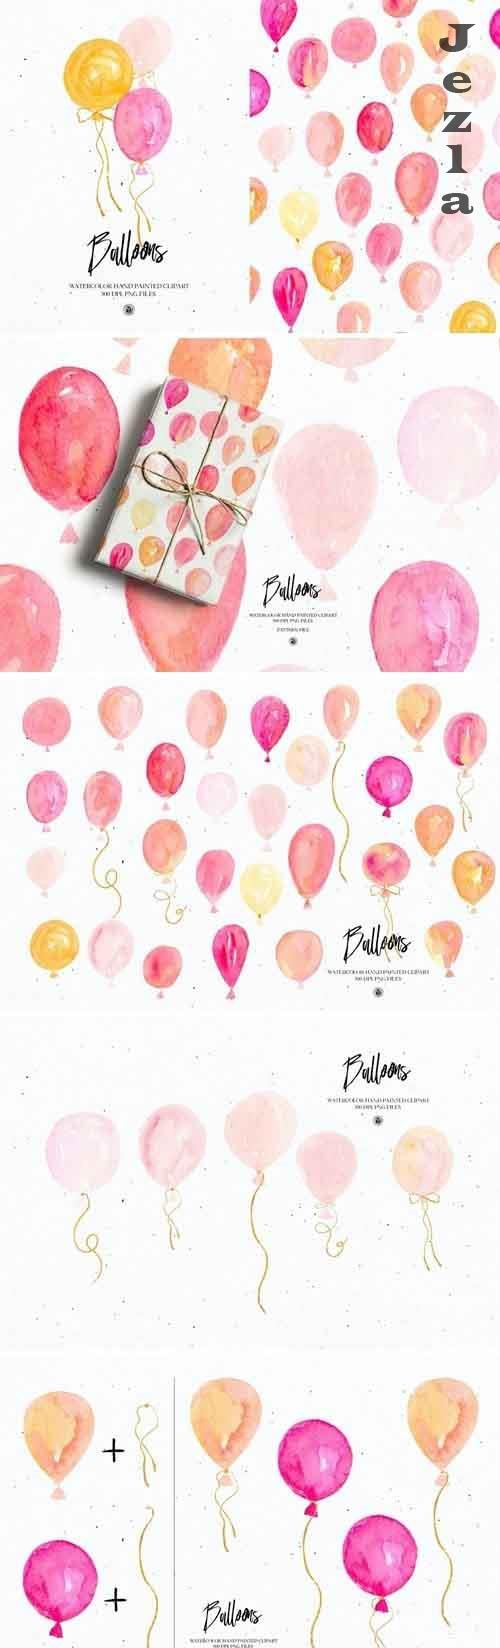 Watercolor Balloons - 5500247